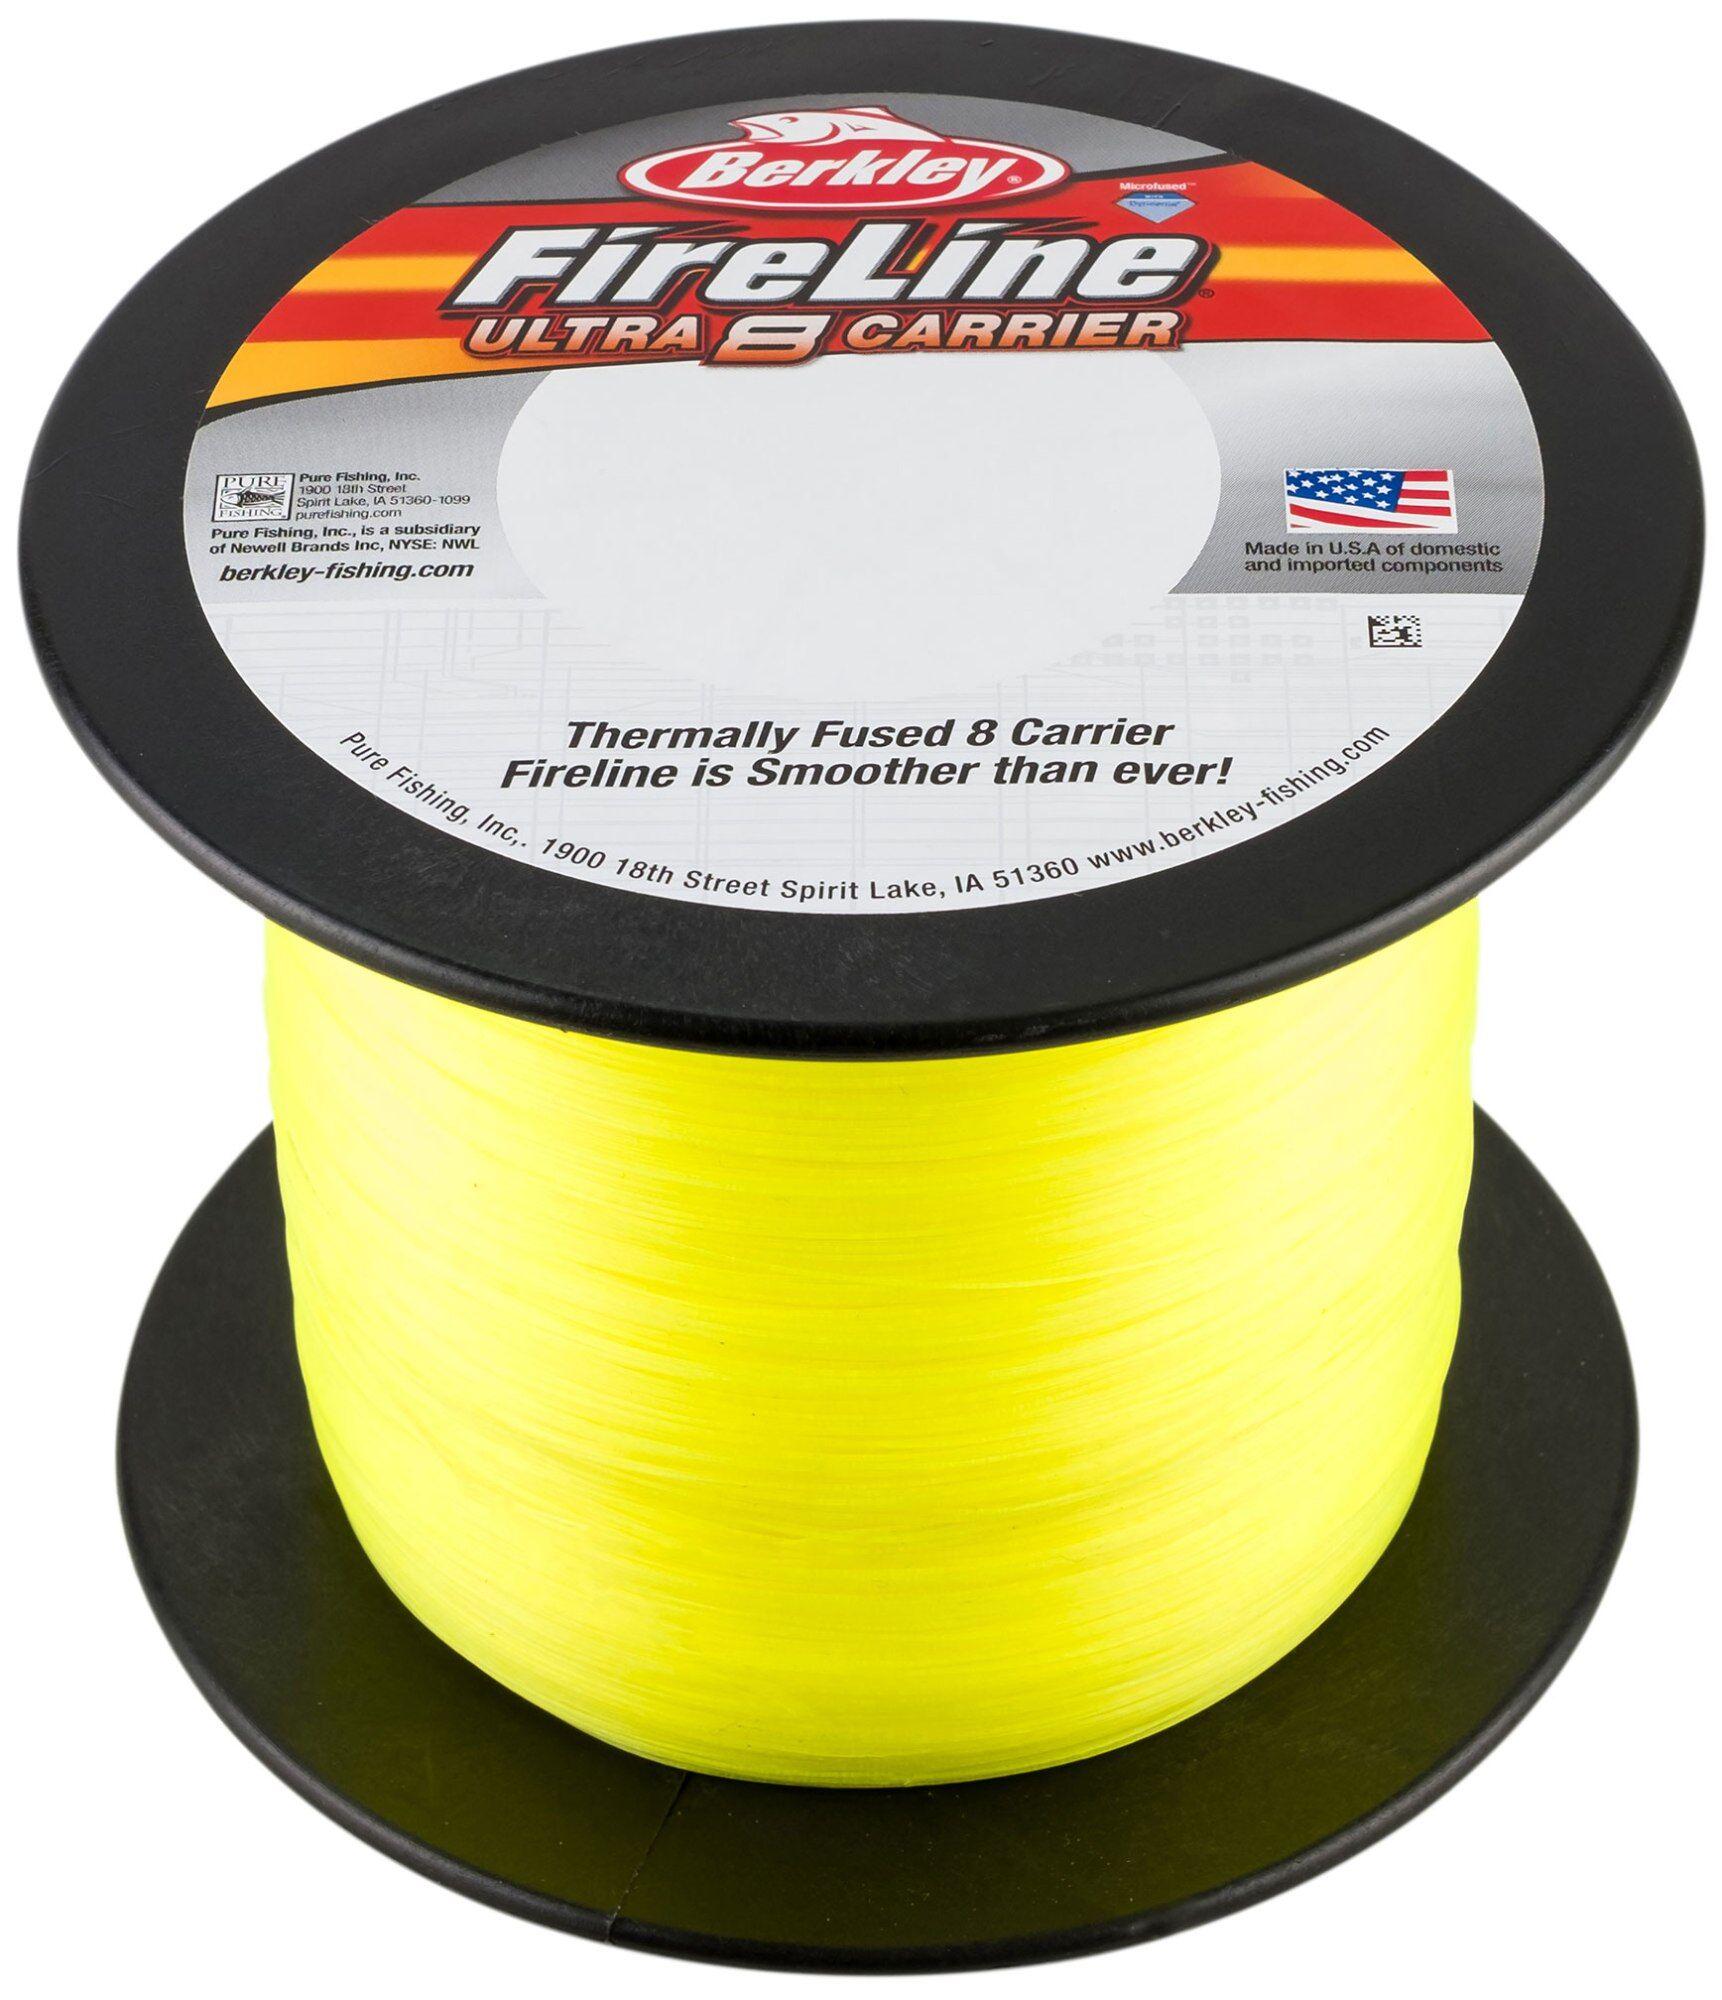 Berkley Fireline Ultra 8 Carrier Flame Green 300 m kuitusiima